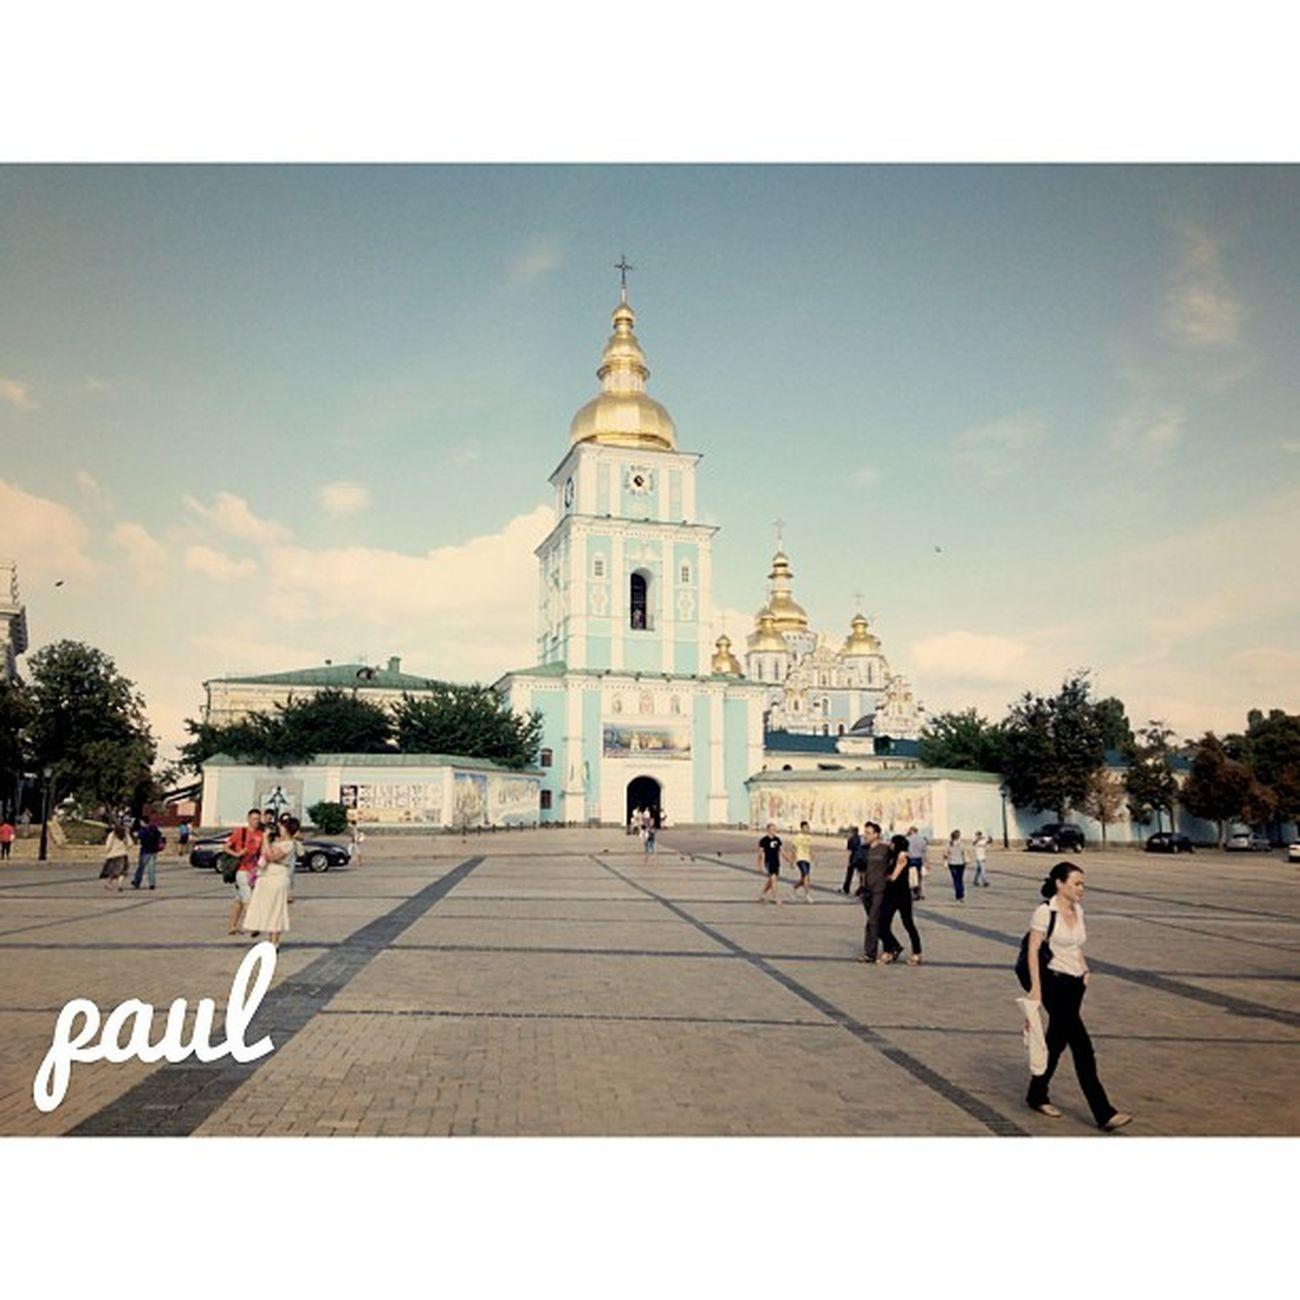 михайловский собор Киев прогулка фото instalook